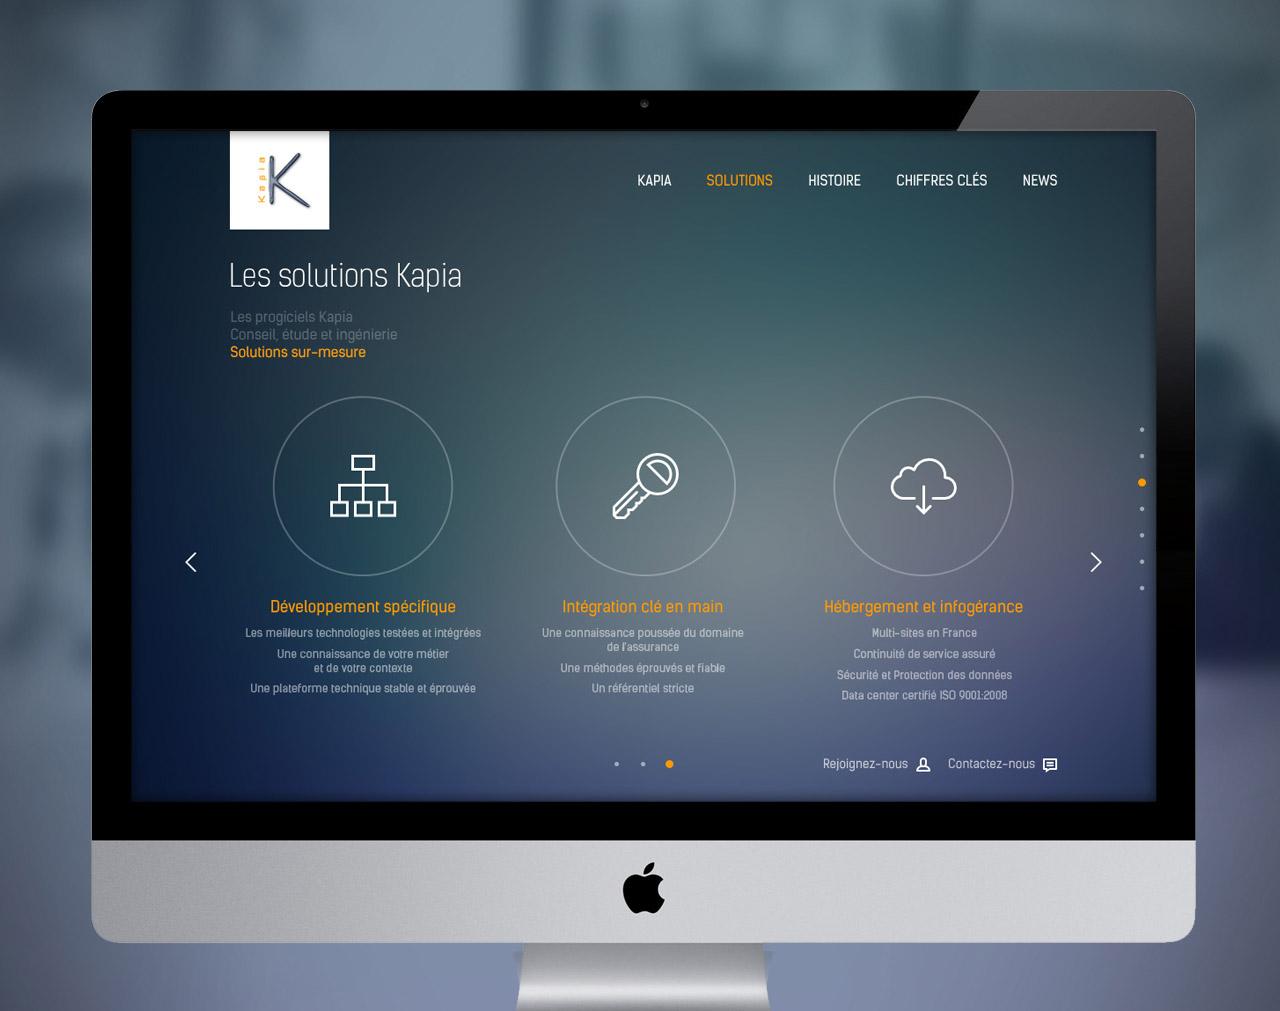 kapia-solutions-services-2-site-internet-responsive-design-creation-communication-caconcept-alexis-cretin-graphiste